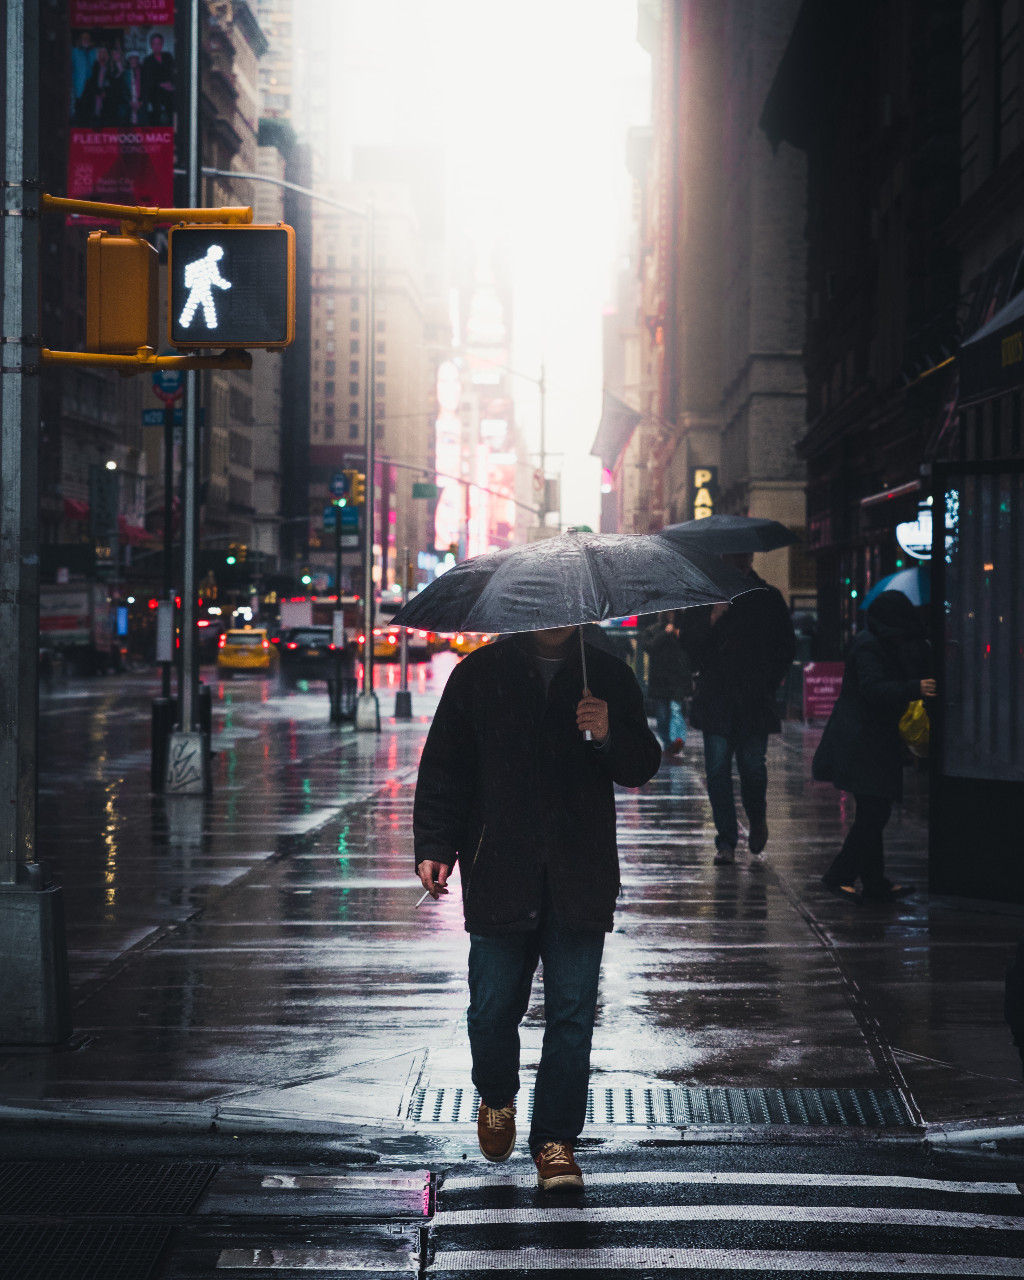 Mensch mit Regenschirm